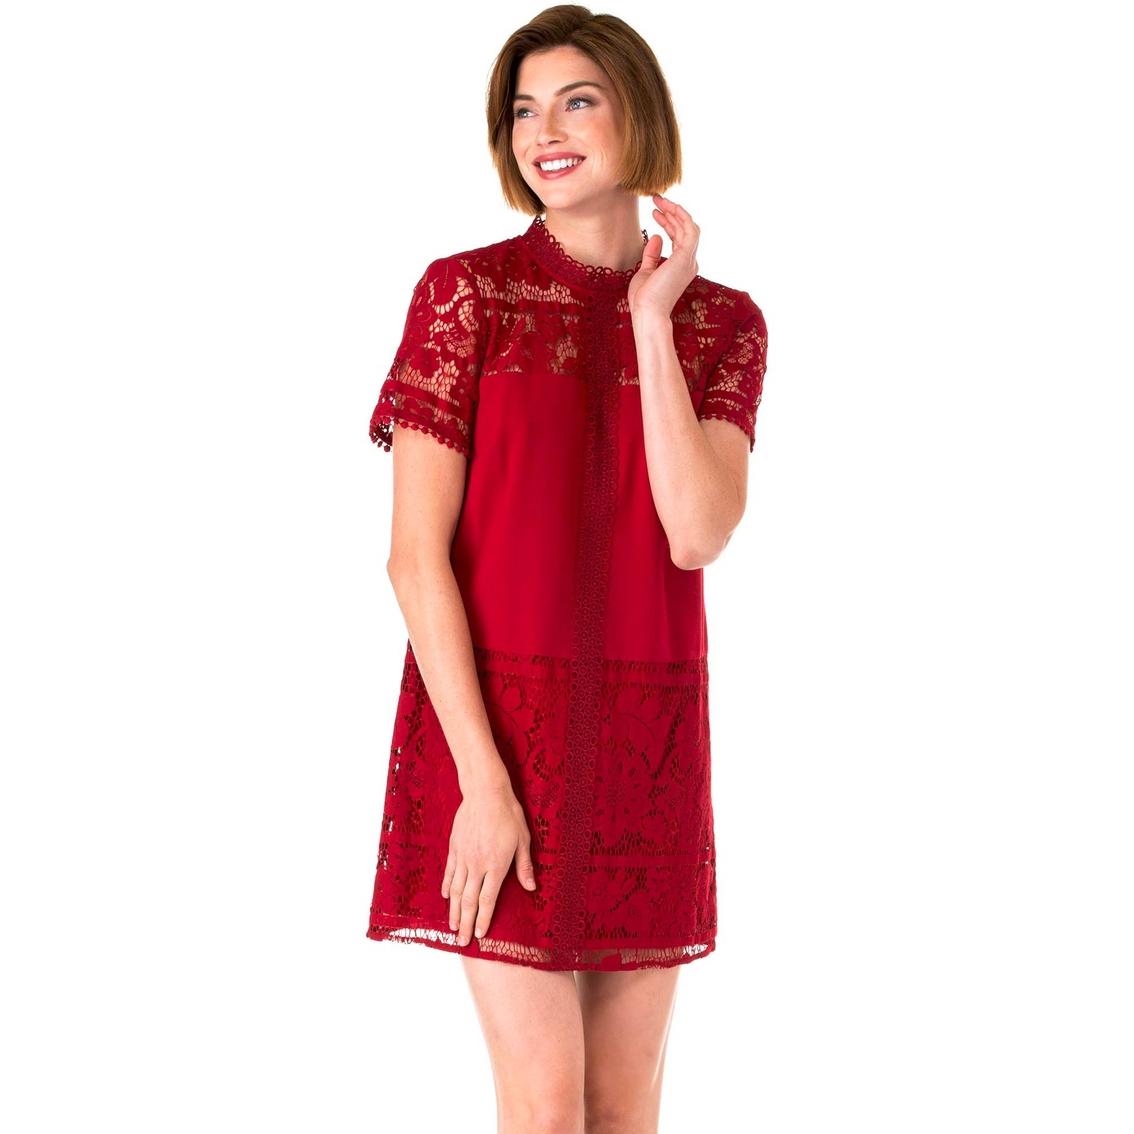 2bb8441c71 Kensie Striped Floral Lace Dress